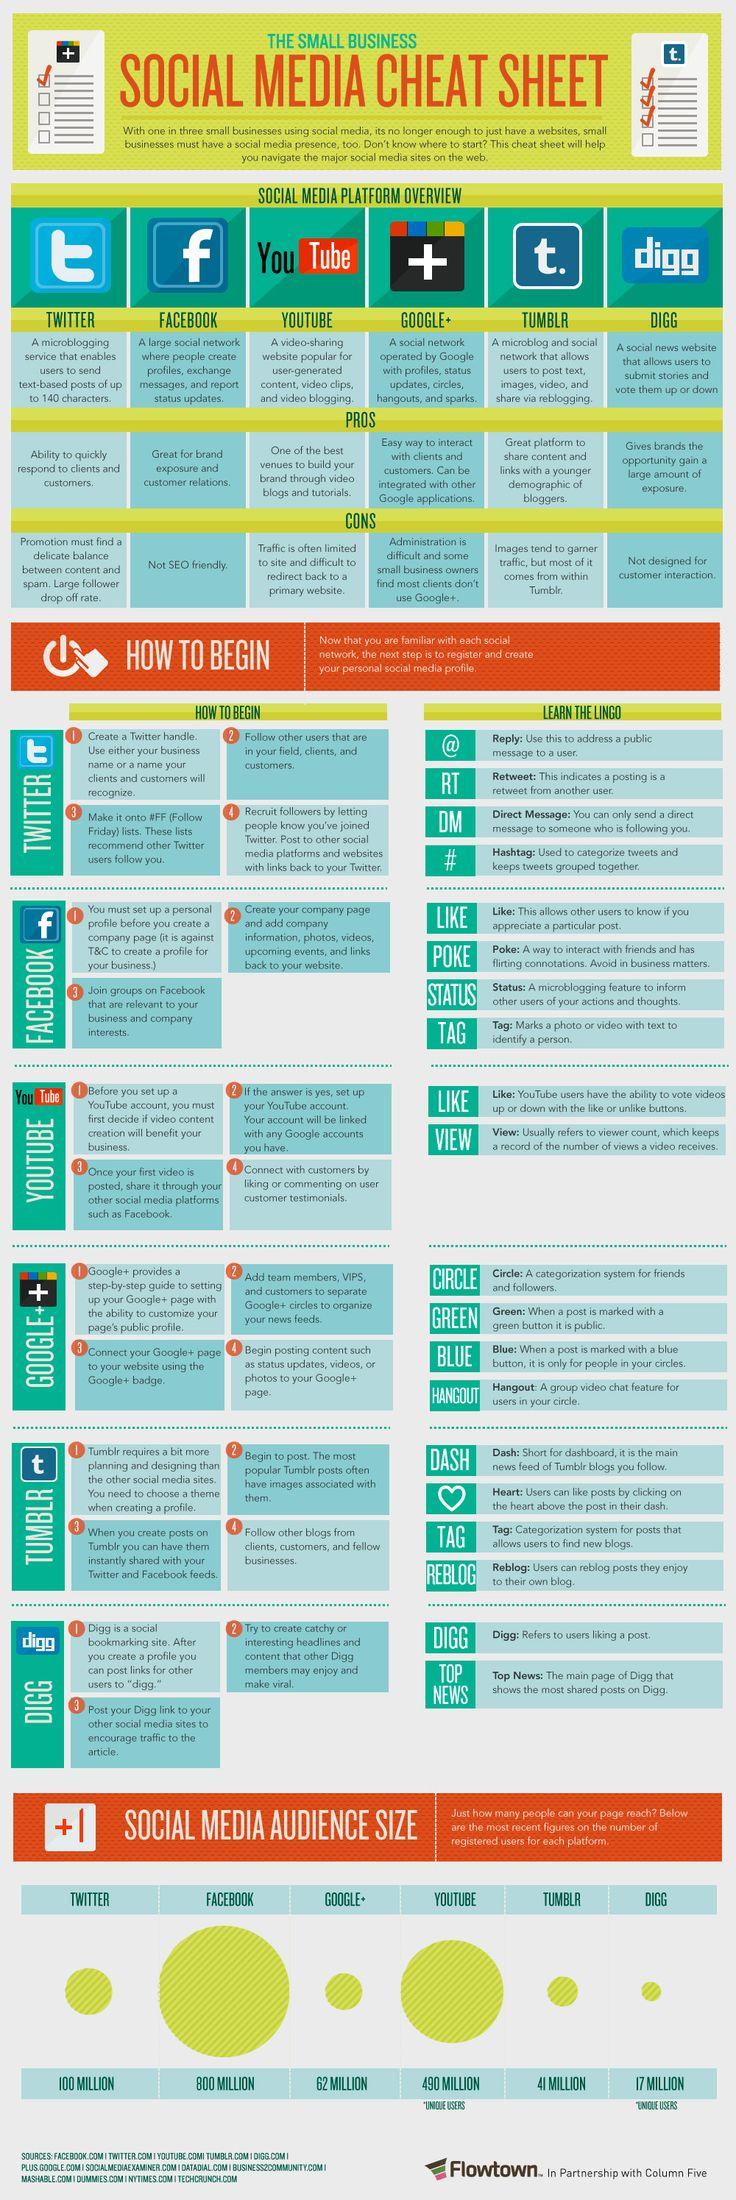 Social Media Cheat Sheet.#infographic